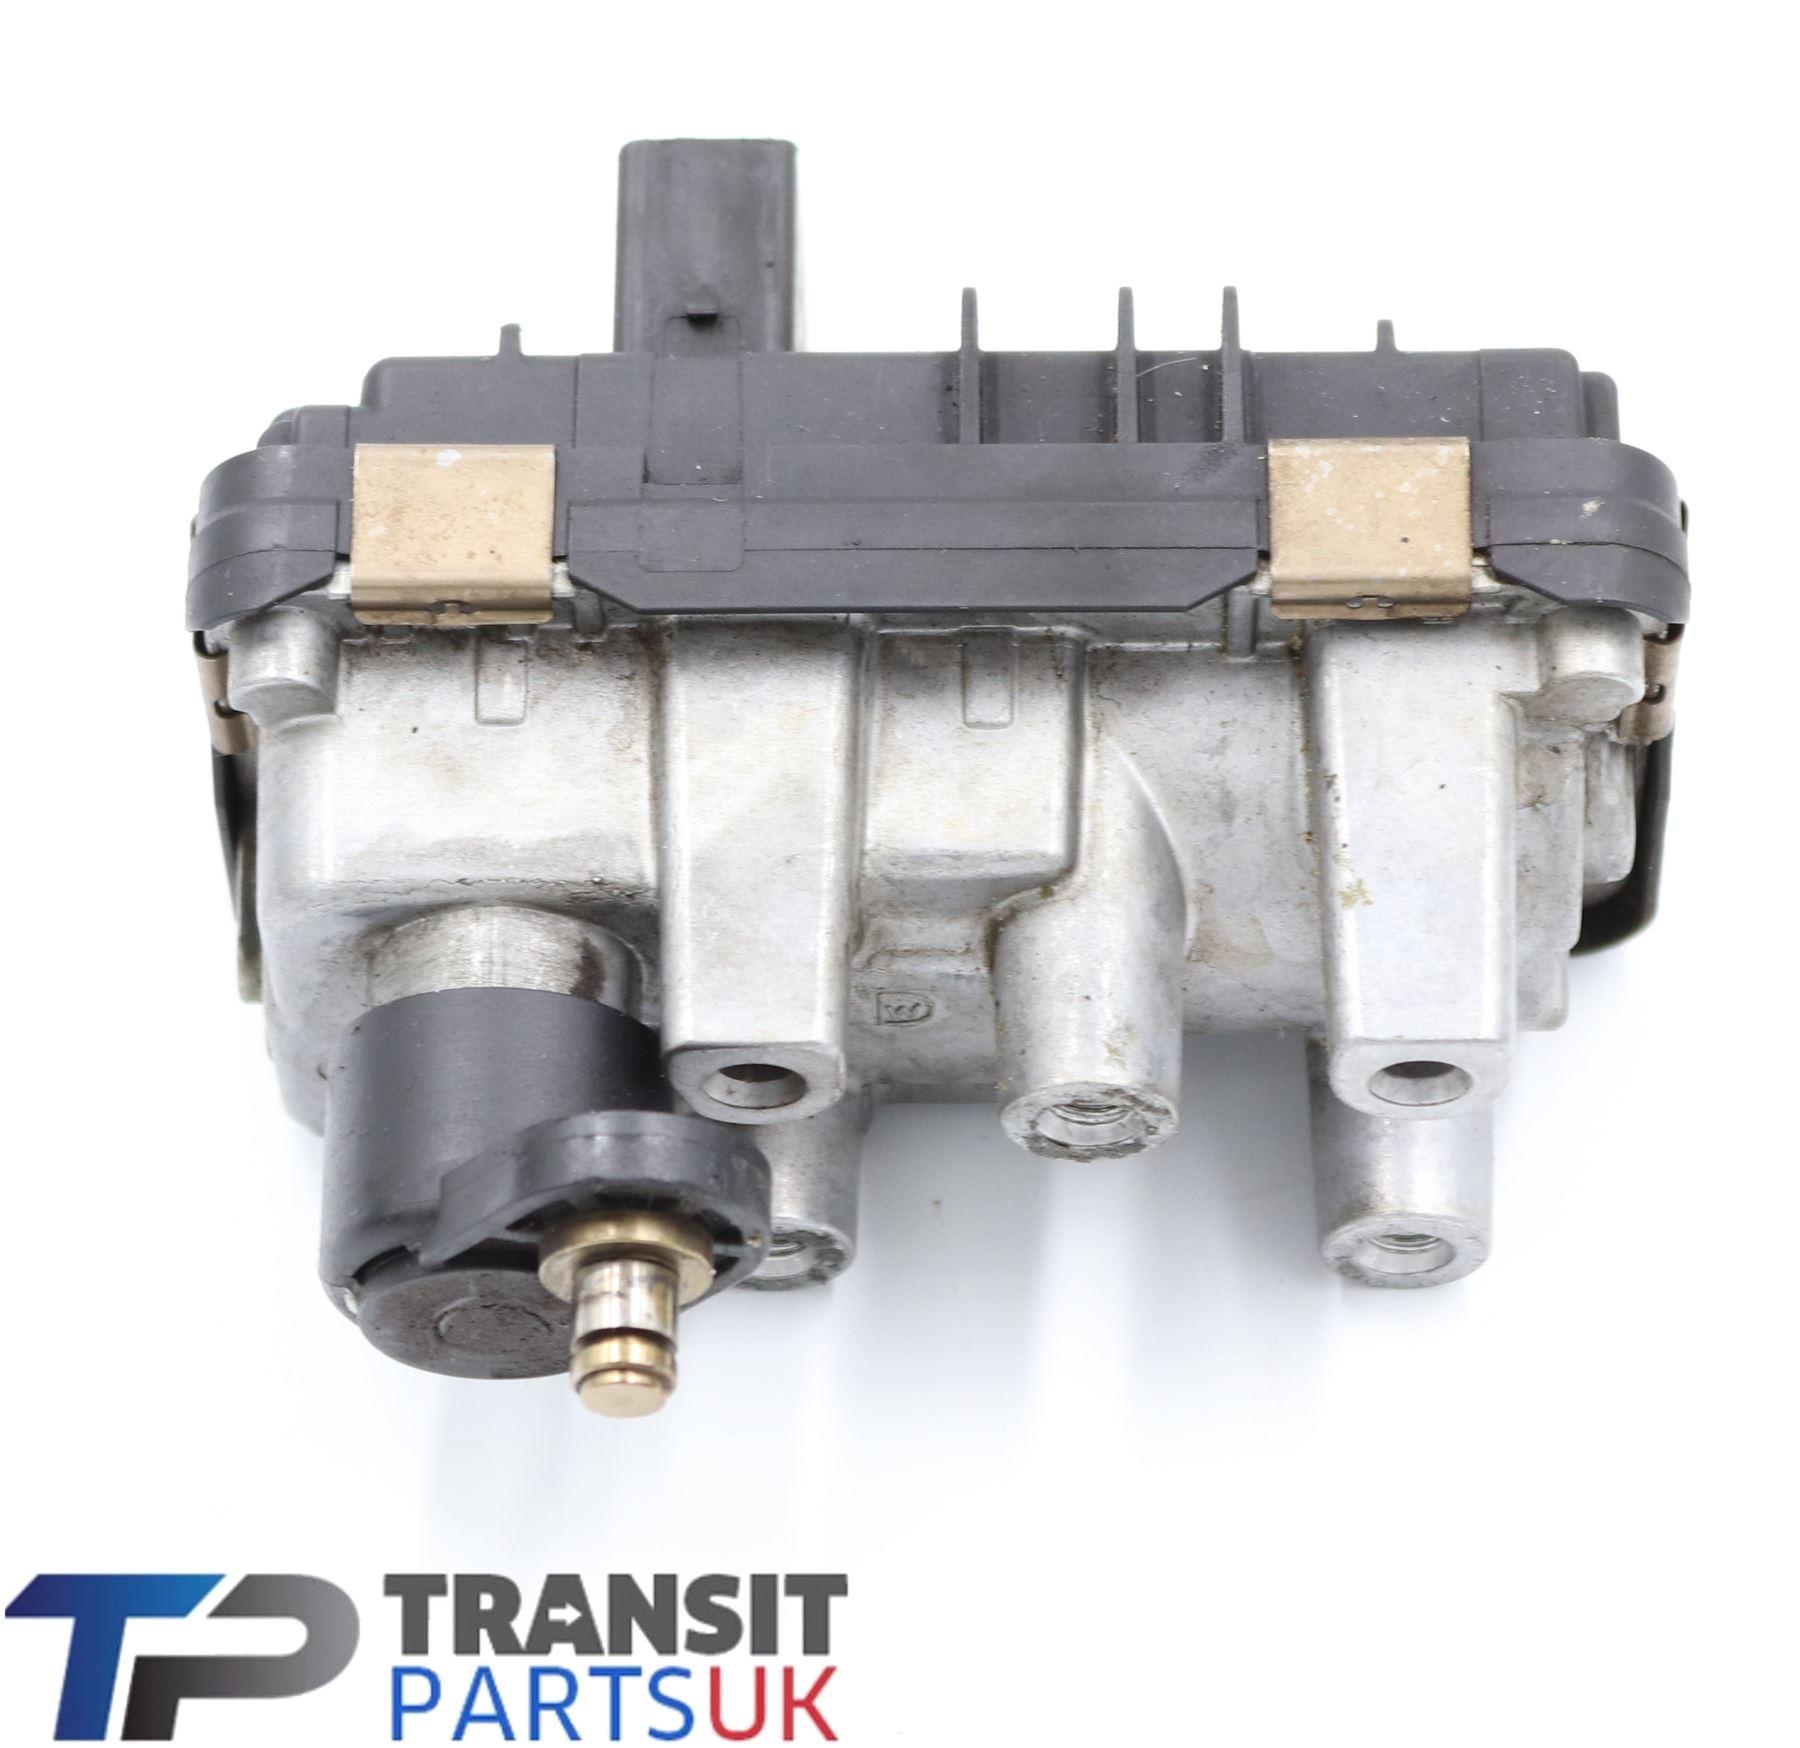 Ford Ranger//Transit MK8 Turbocompresseur Servomoteur 2.2 TDCi Turbo 787556 Electronic